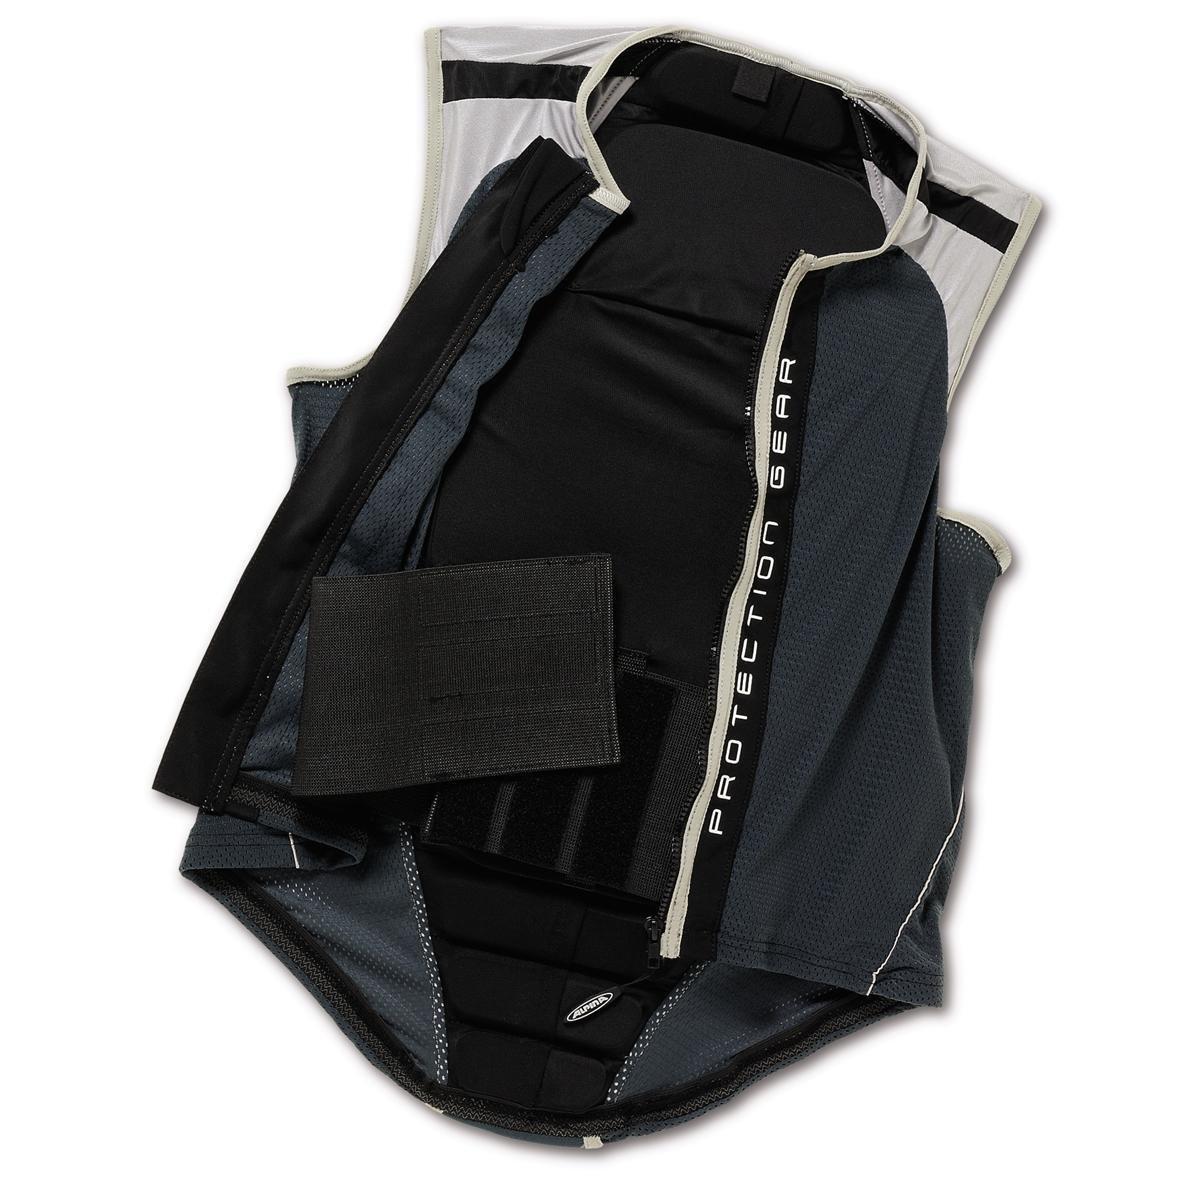 ALPINA Rücken Jacket Soft Protector Rückenprotektor